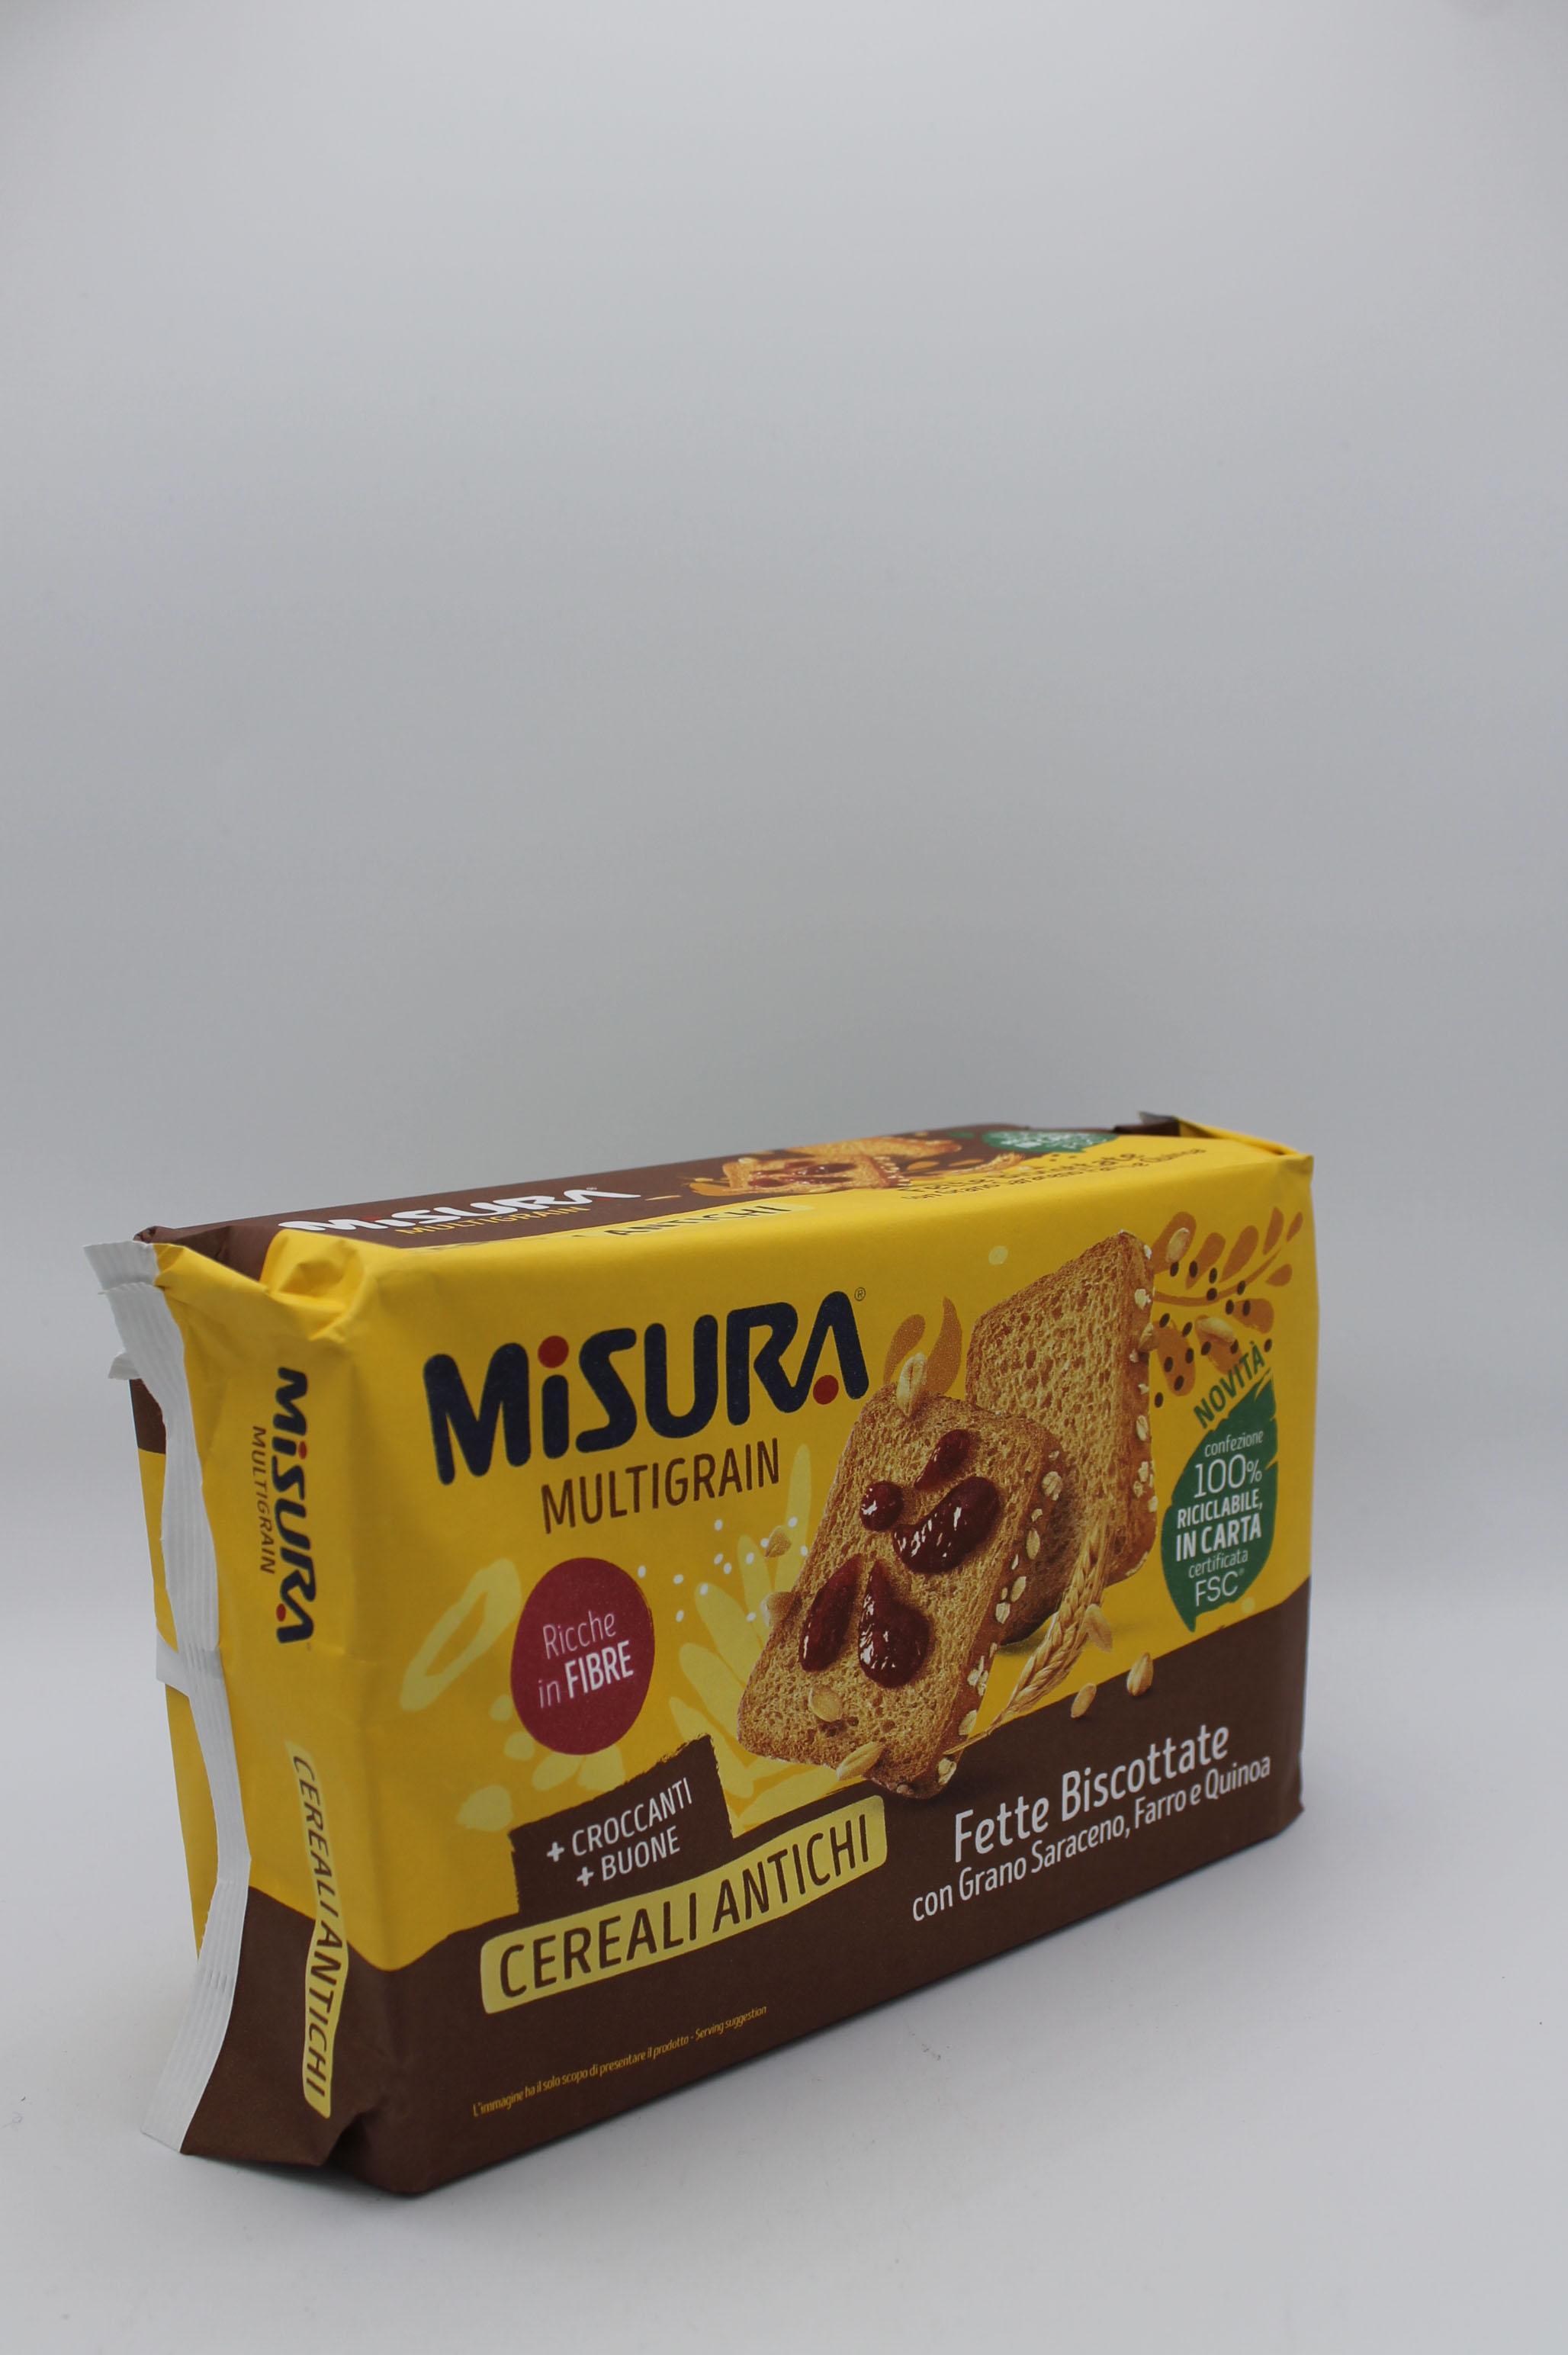 Misura fette biscottate cereali antichi 320 gr.